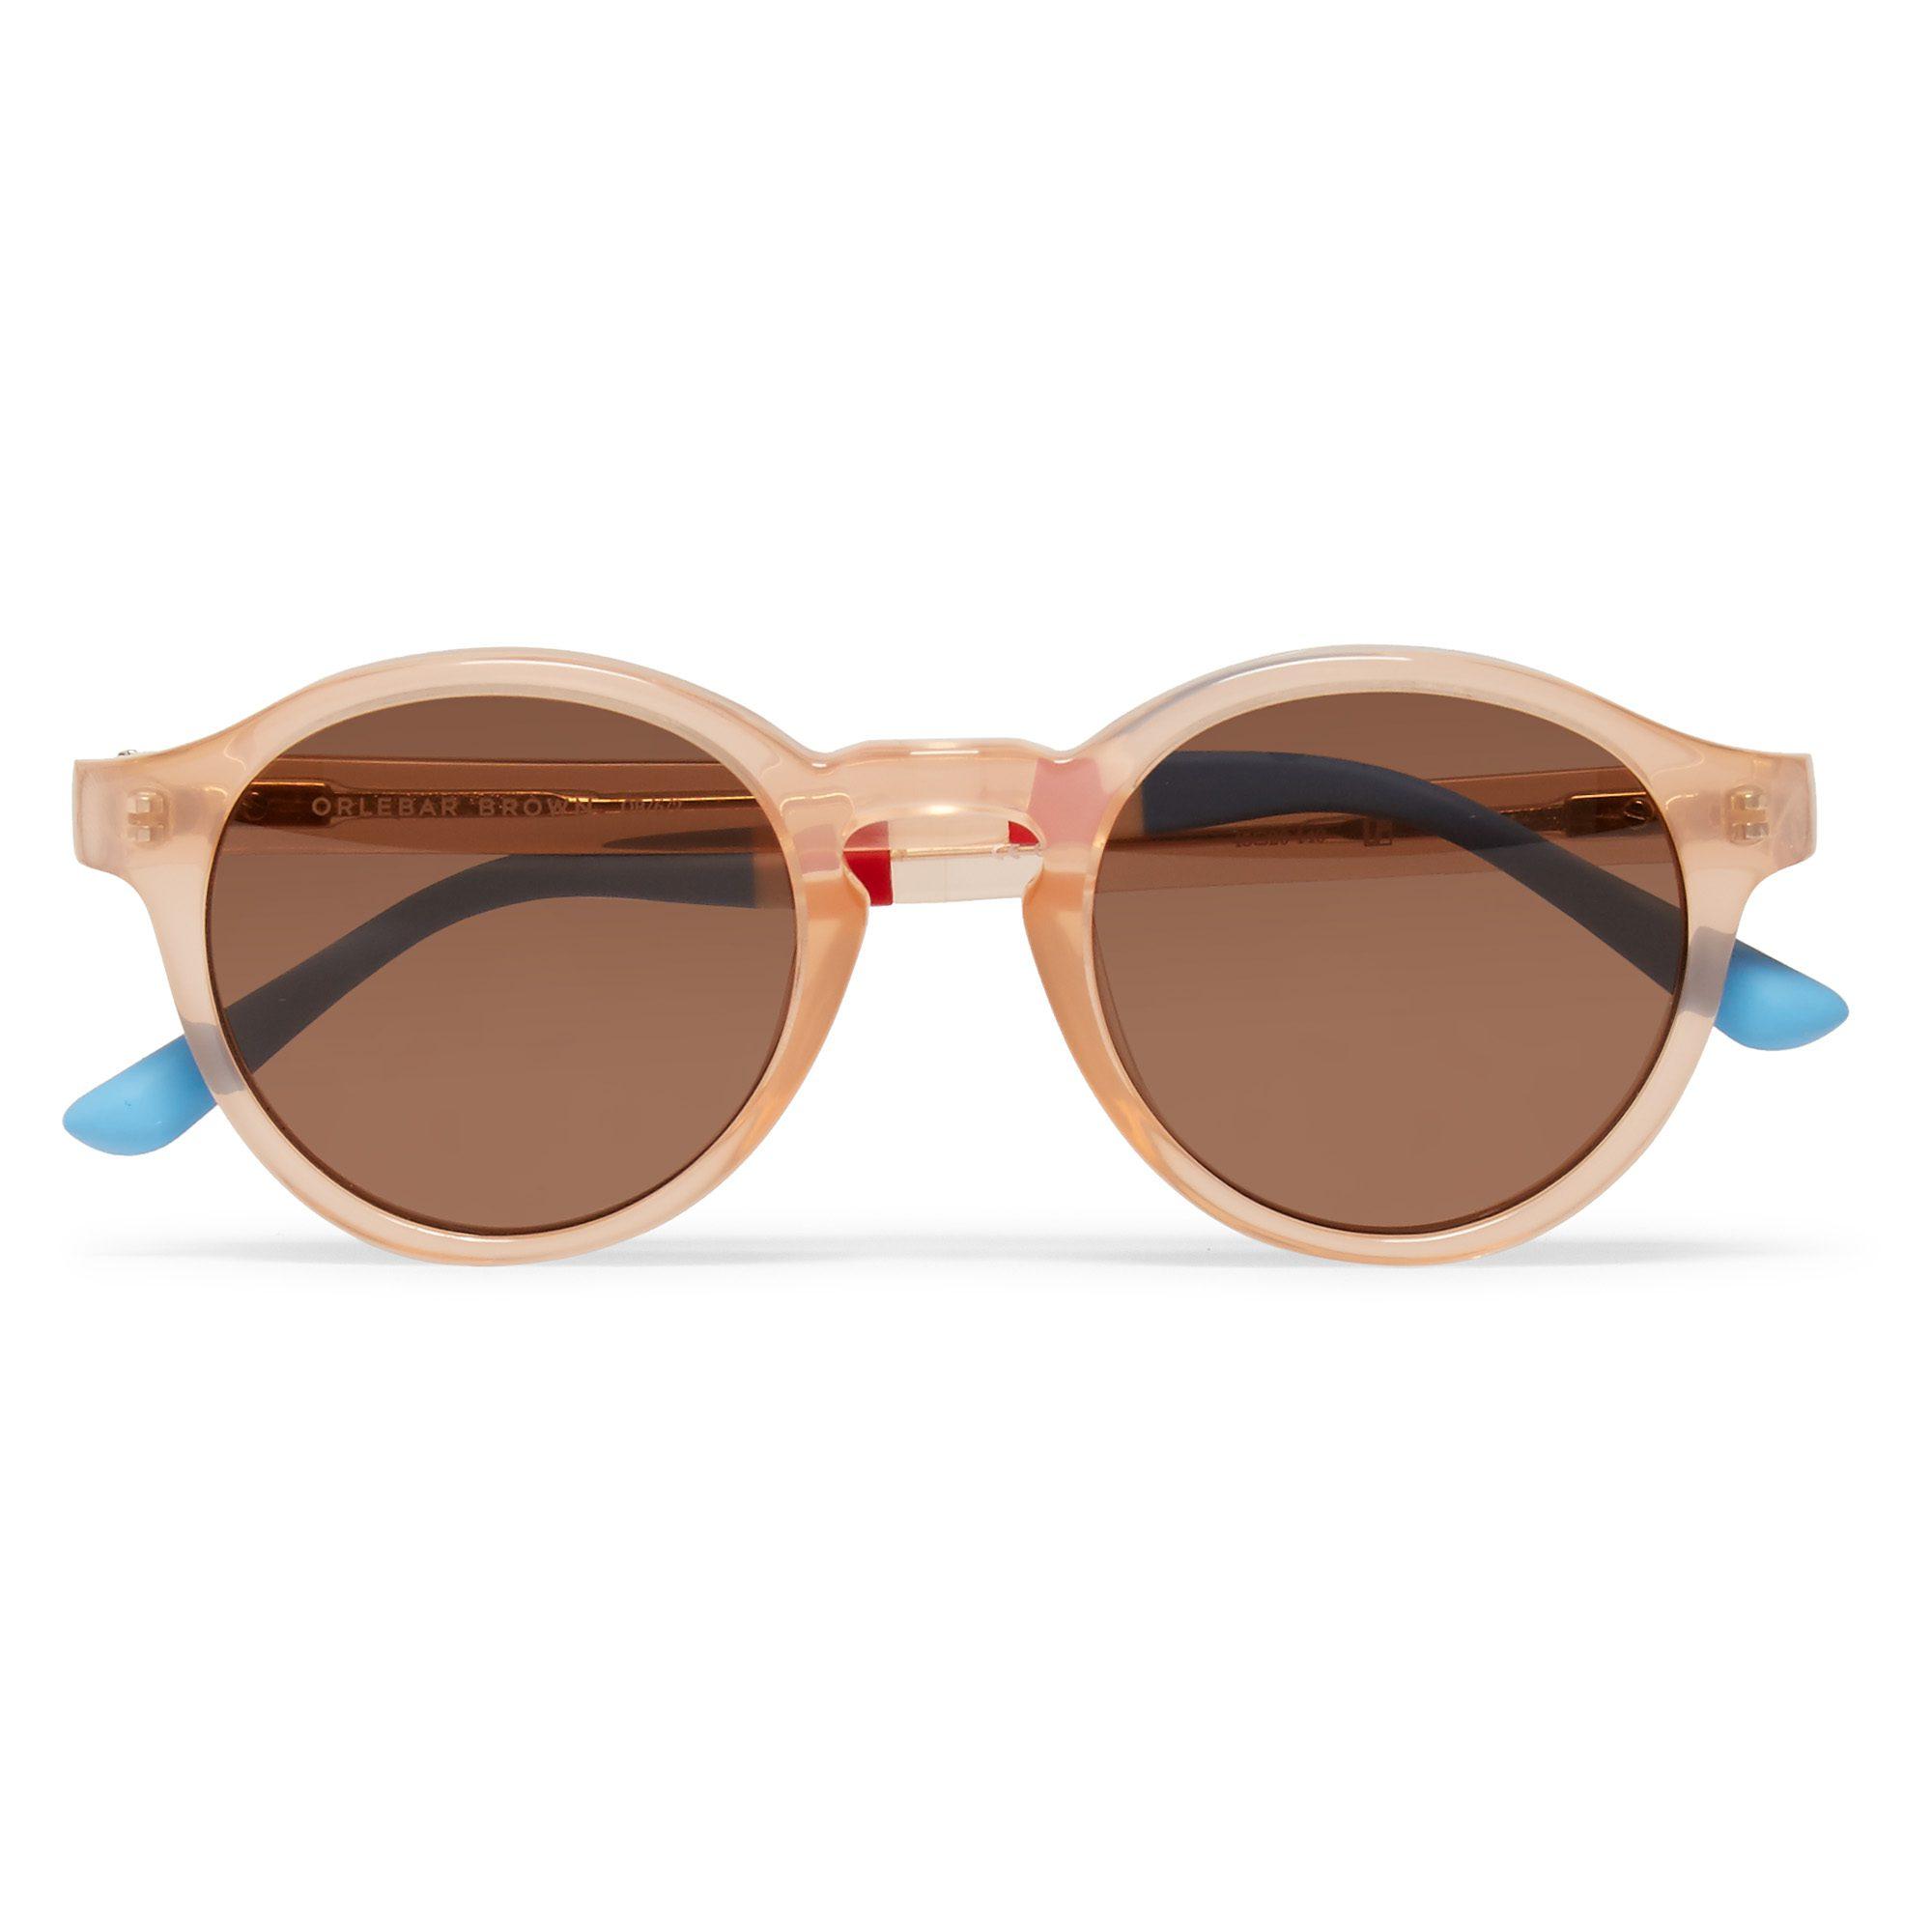 Orlebar-Brown-Spring-2016-Sunglasses_GRANDY_OB6C2SUN_BLUSH_TAWNYBROWN_RIVIERA.jpg